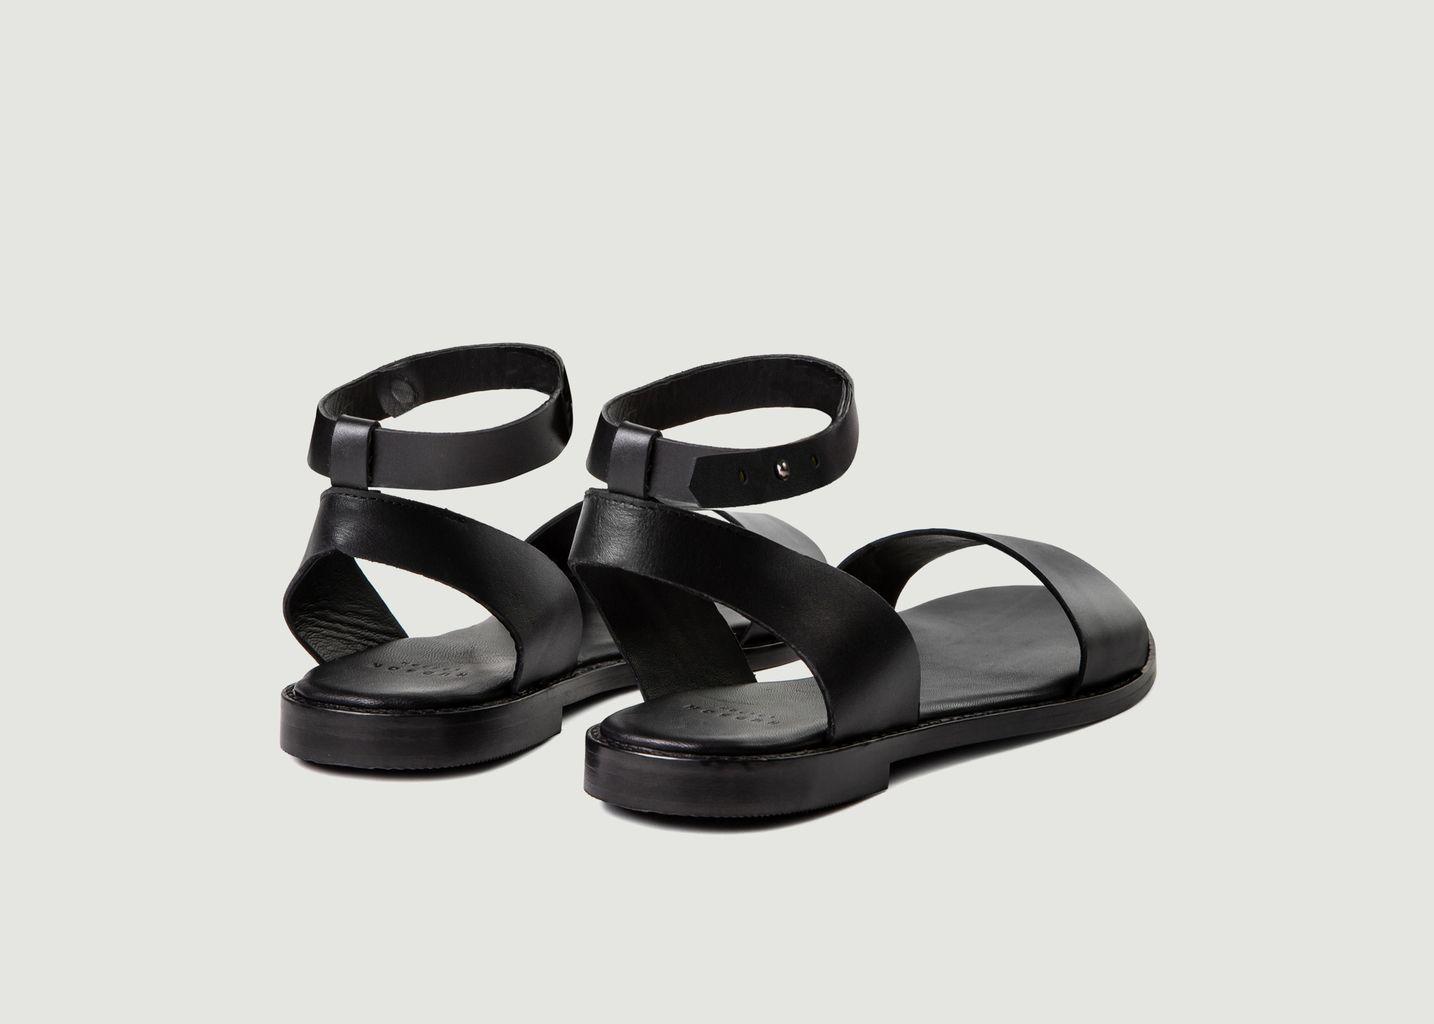 Anfisa sandals - Hudson